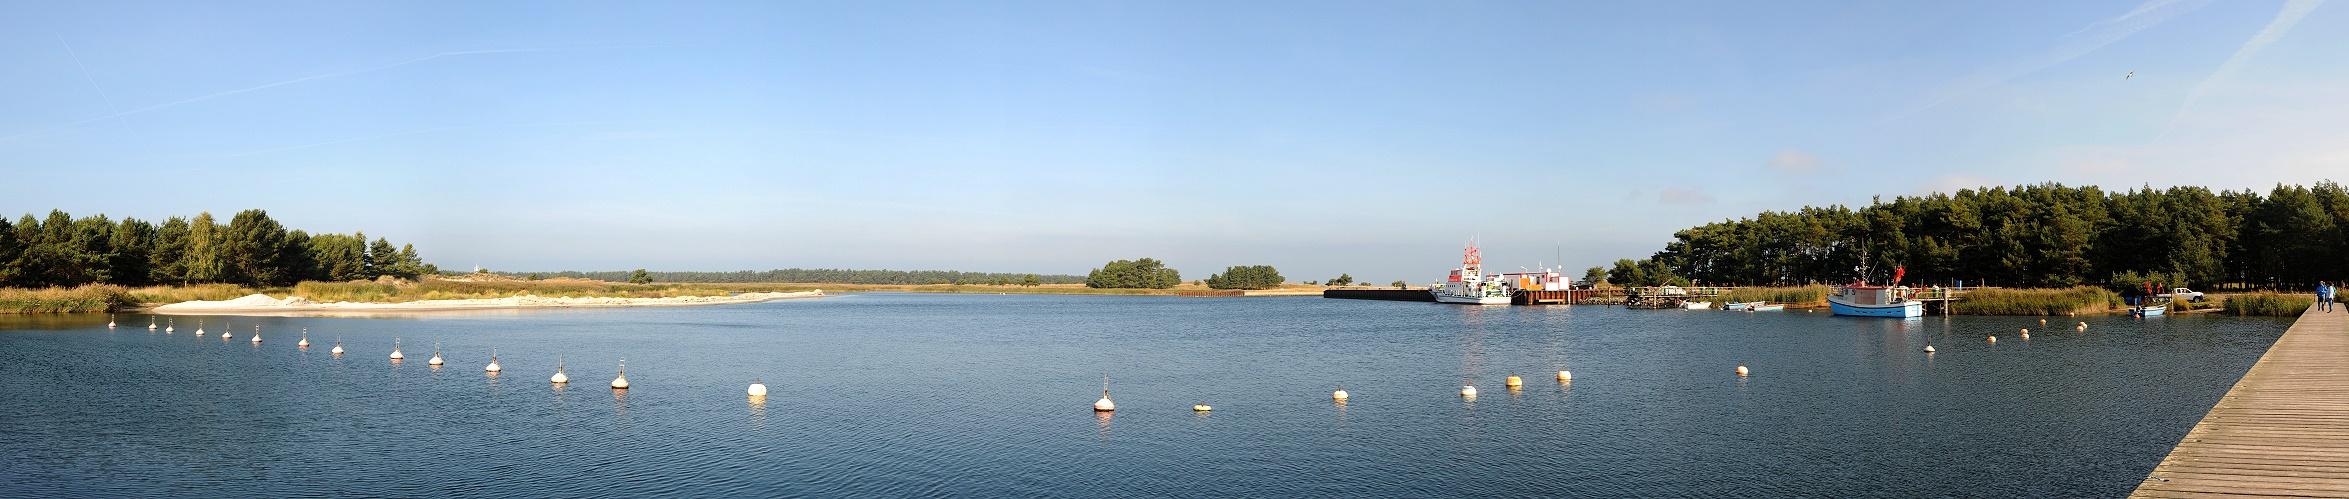 Pano - Alter Militärhafen Prerow